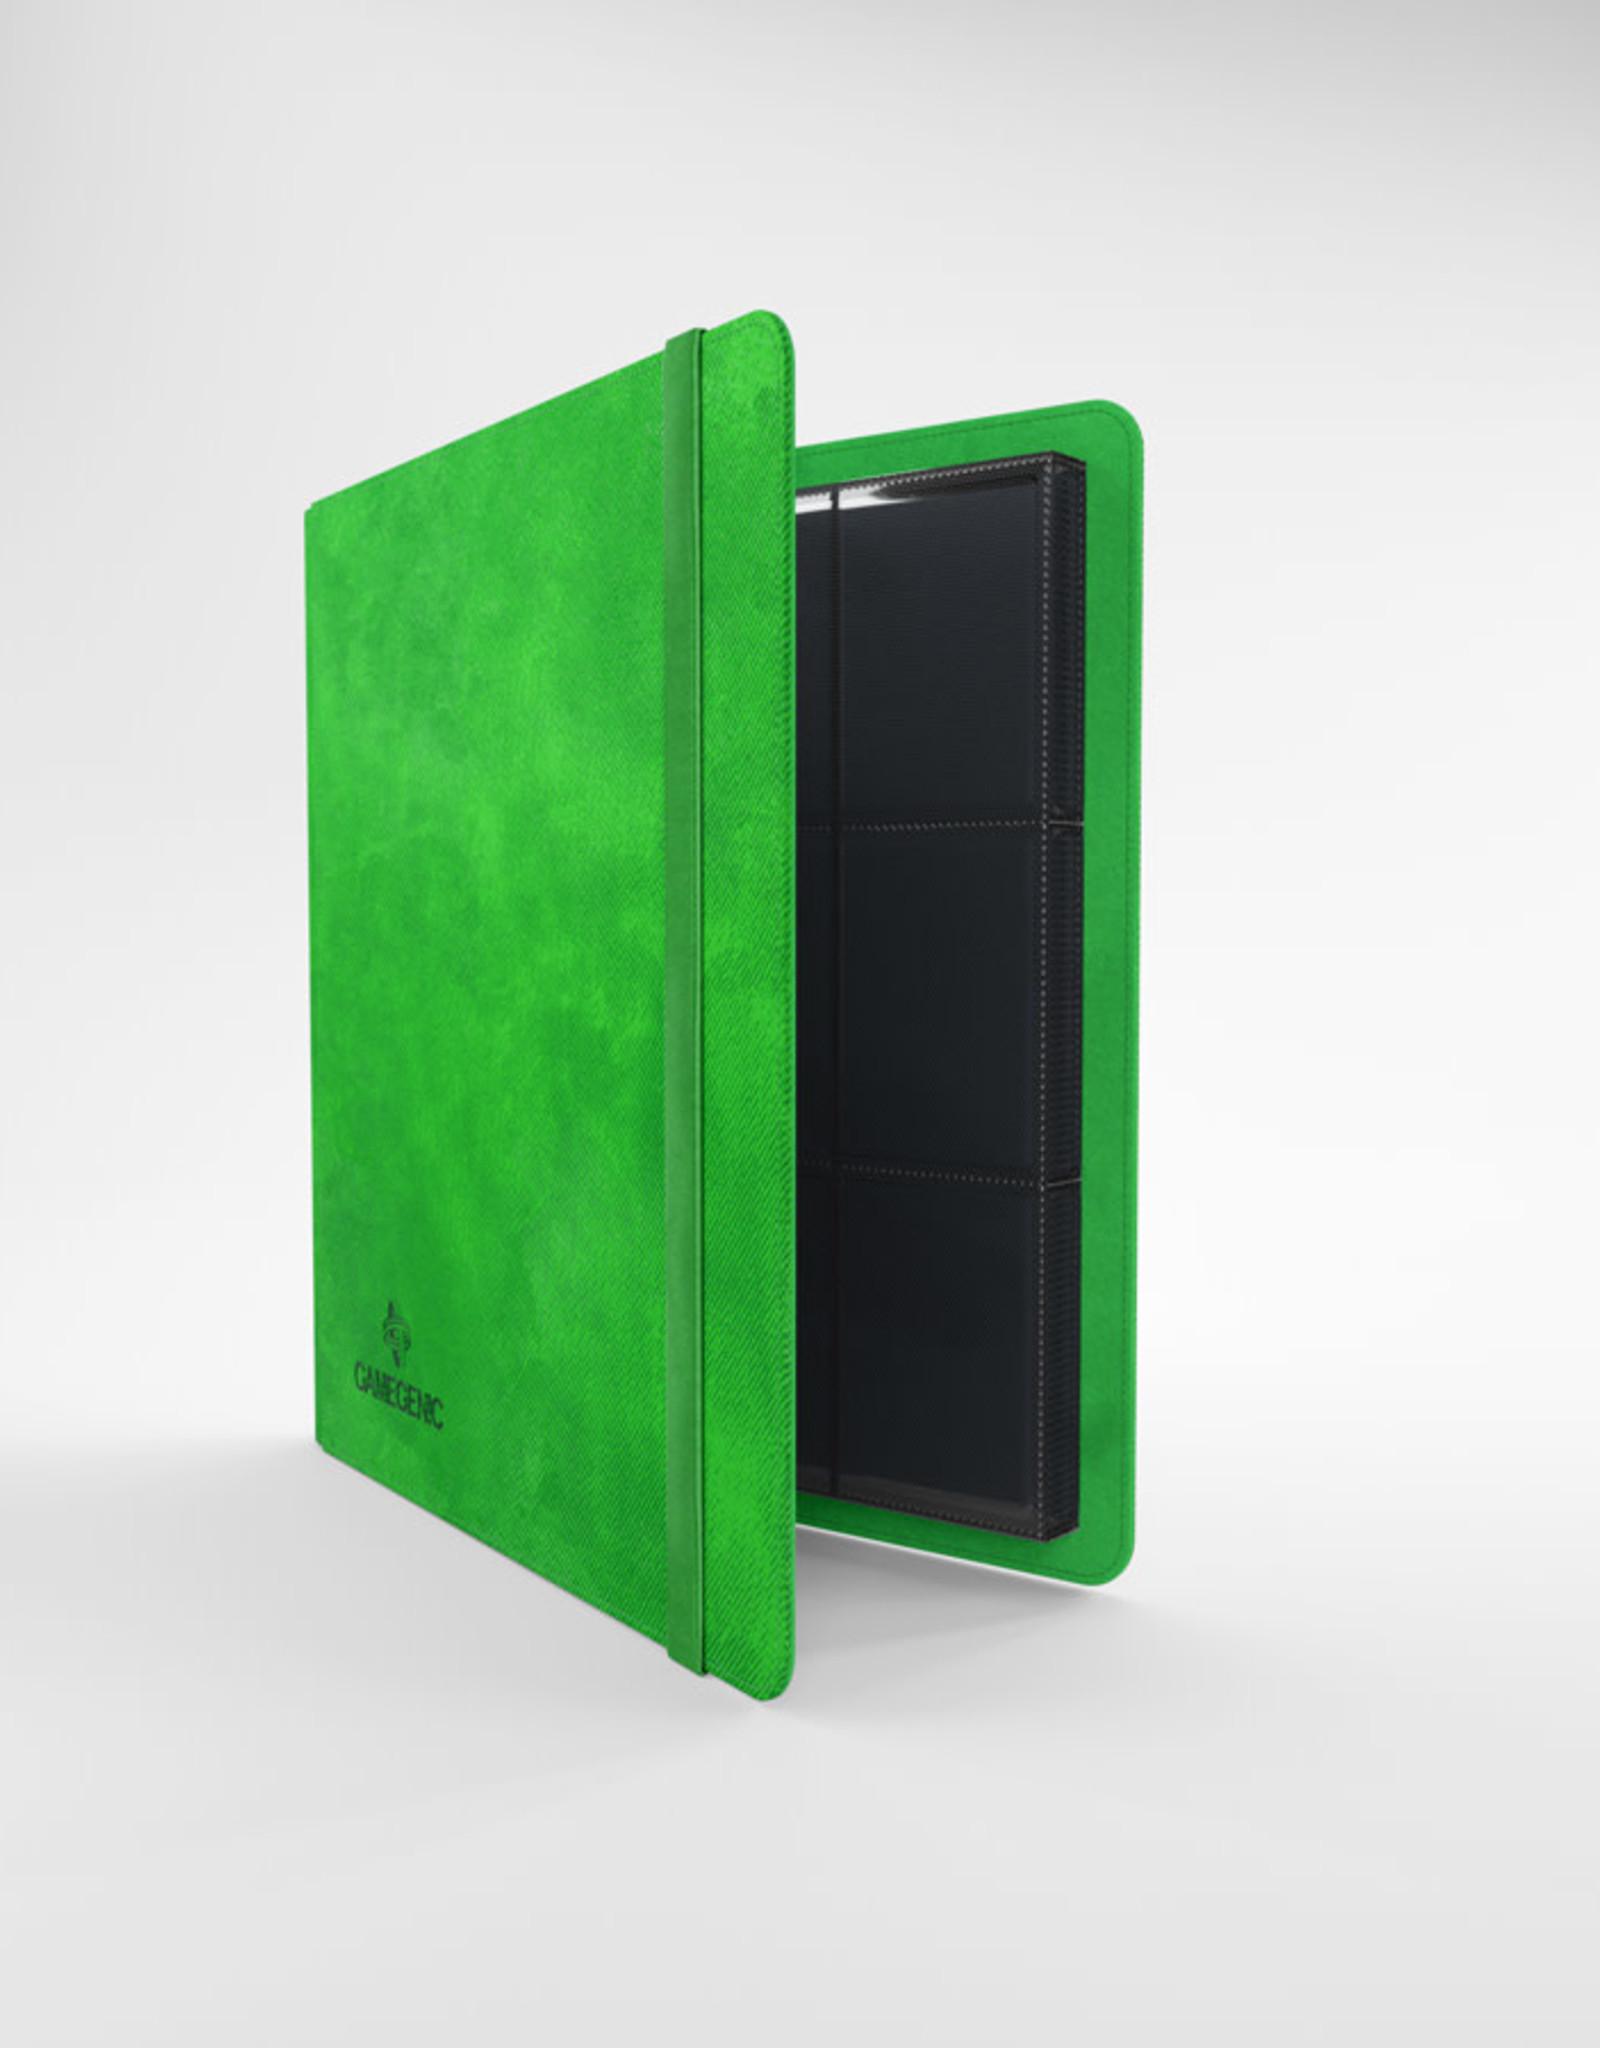 Prime Album: 24-Pocket Side-Loading Green